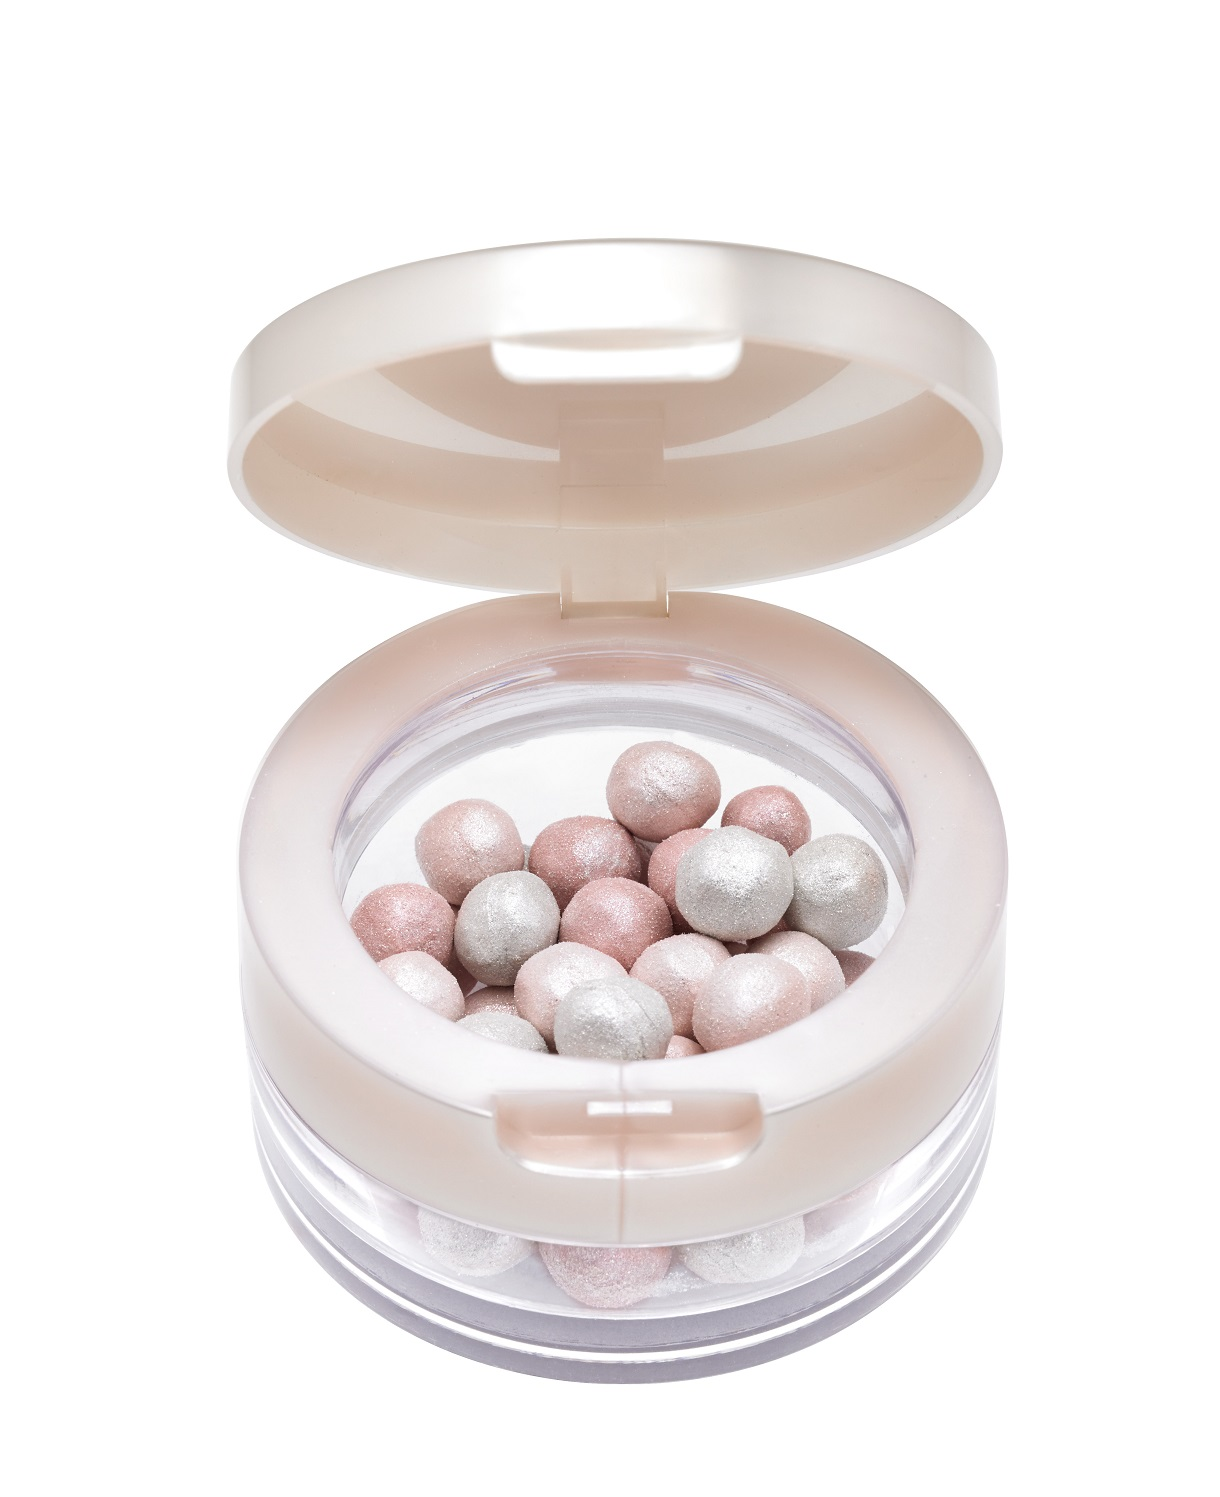 essence aquatix – shimmer pearls